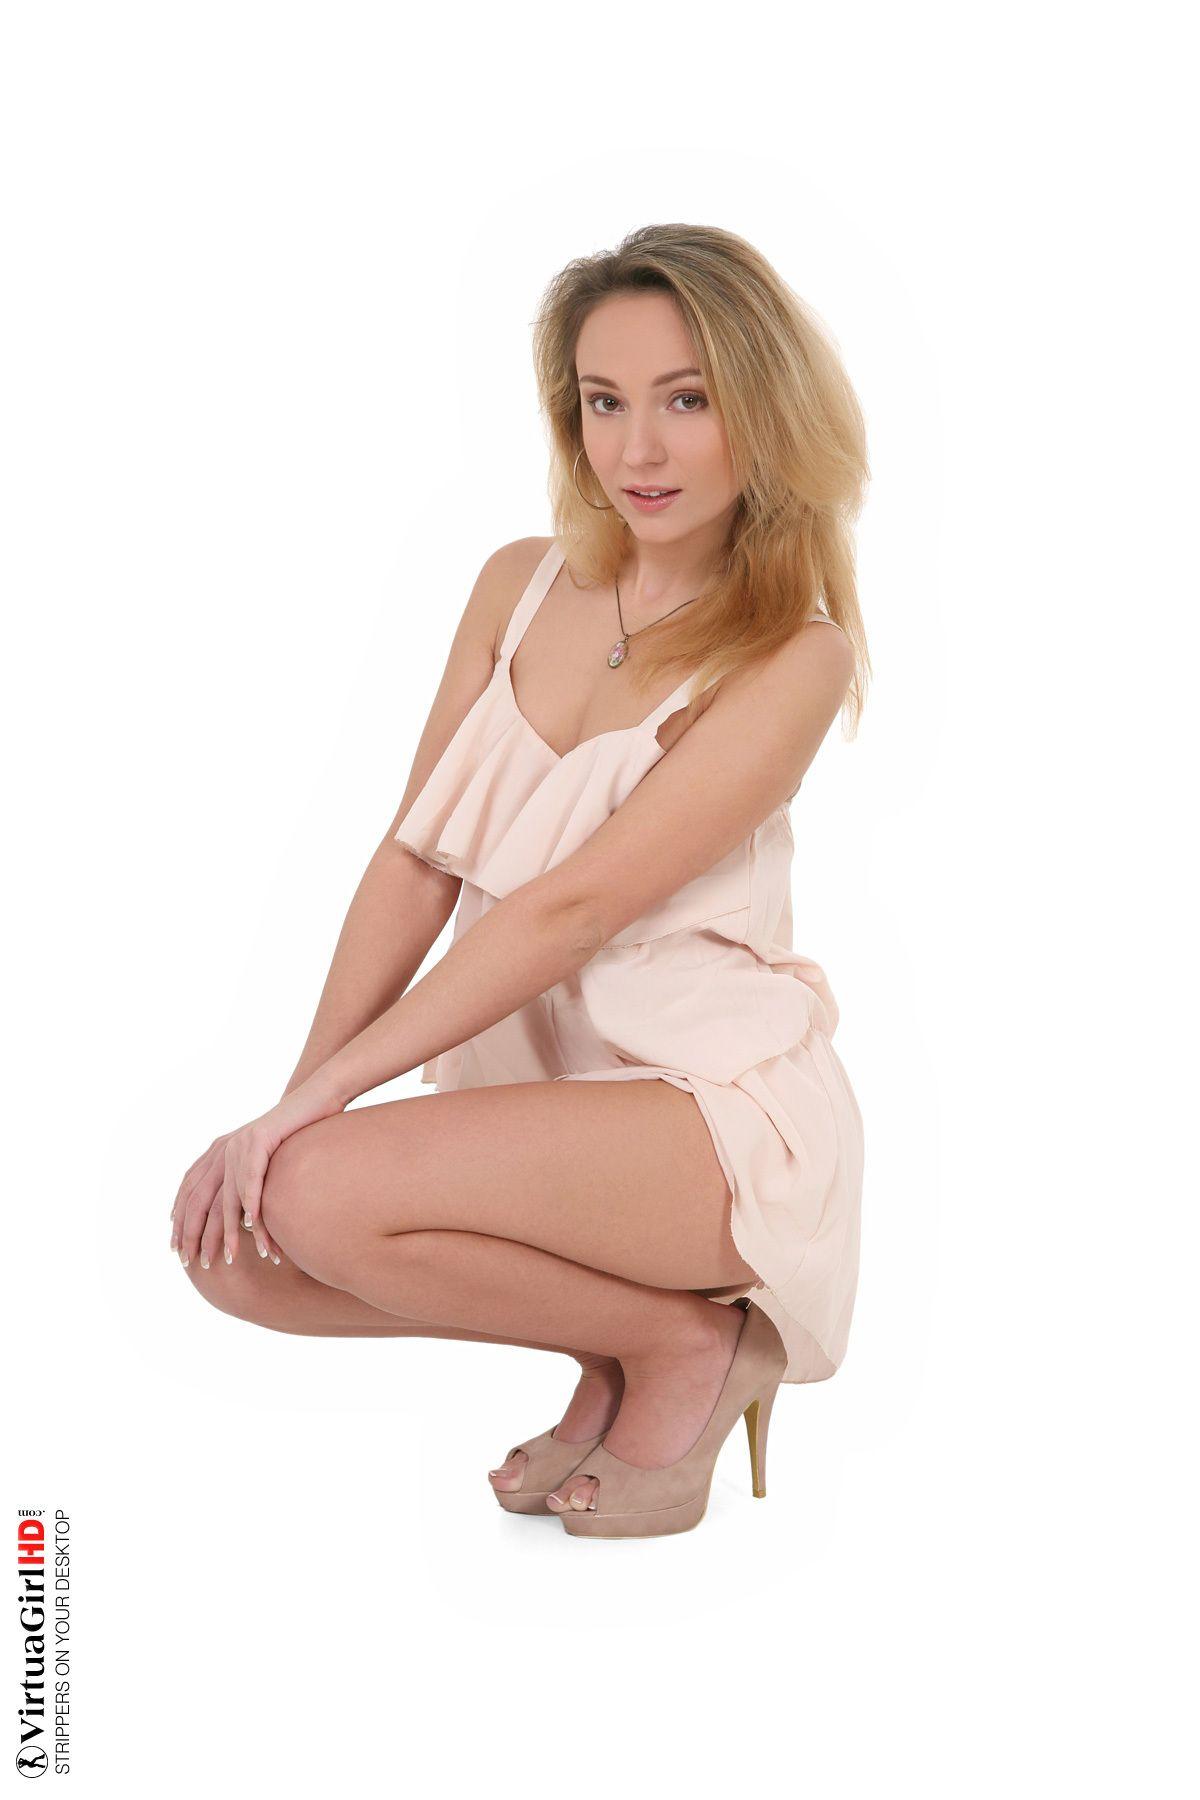 Nataly Von - ELEGANT 02